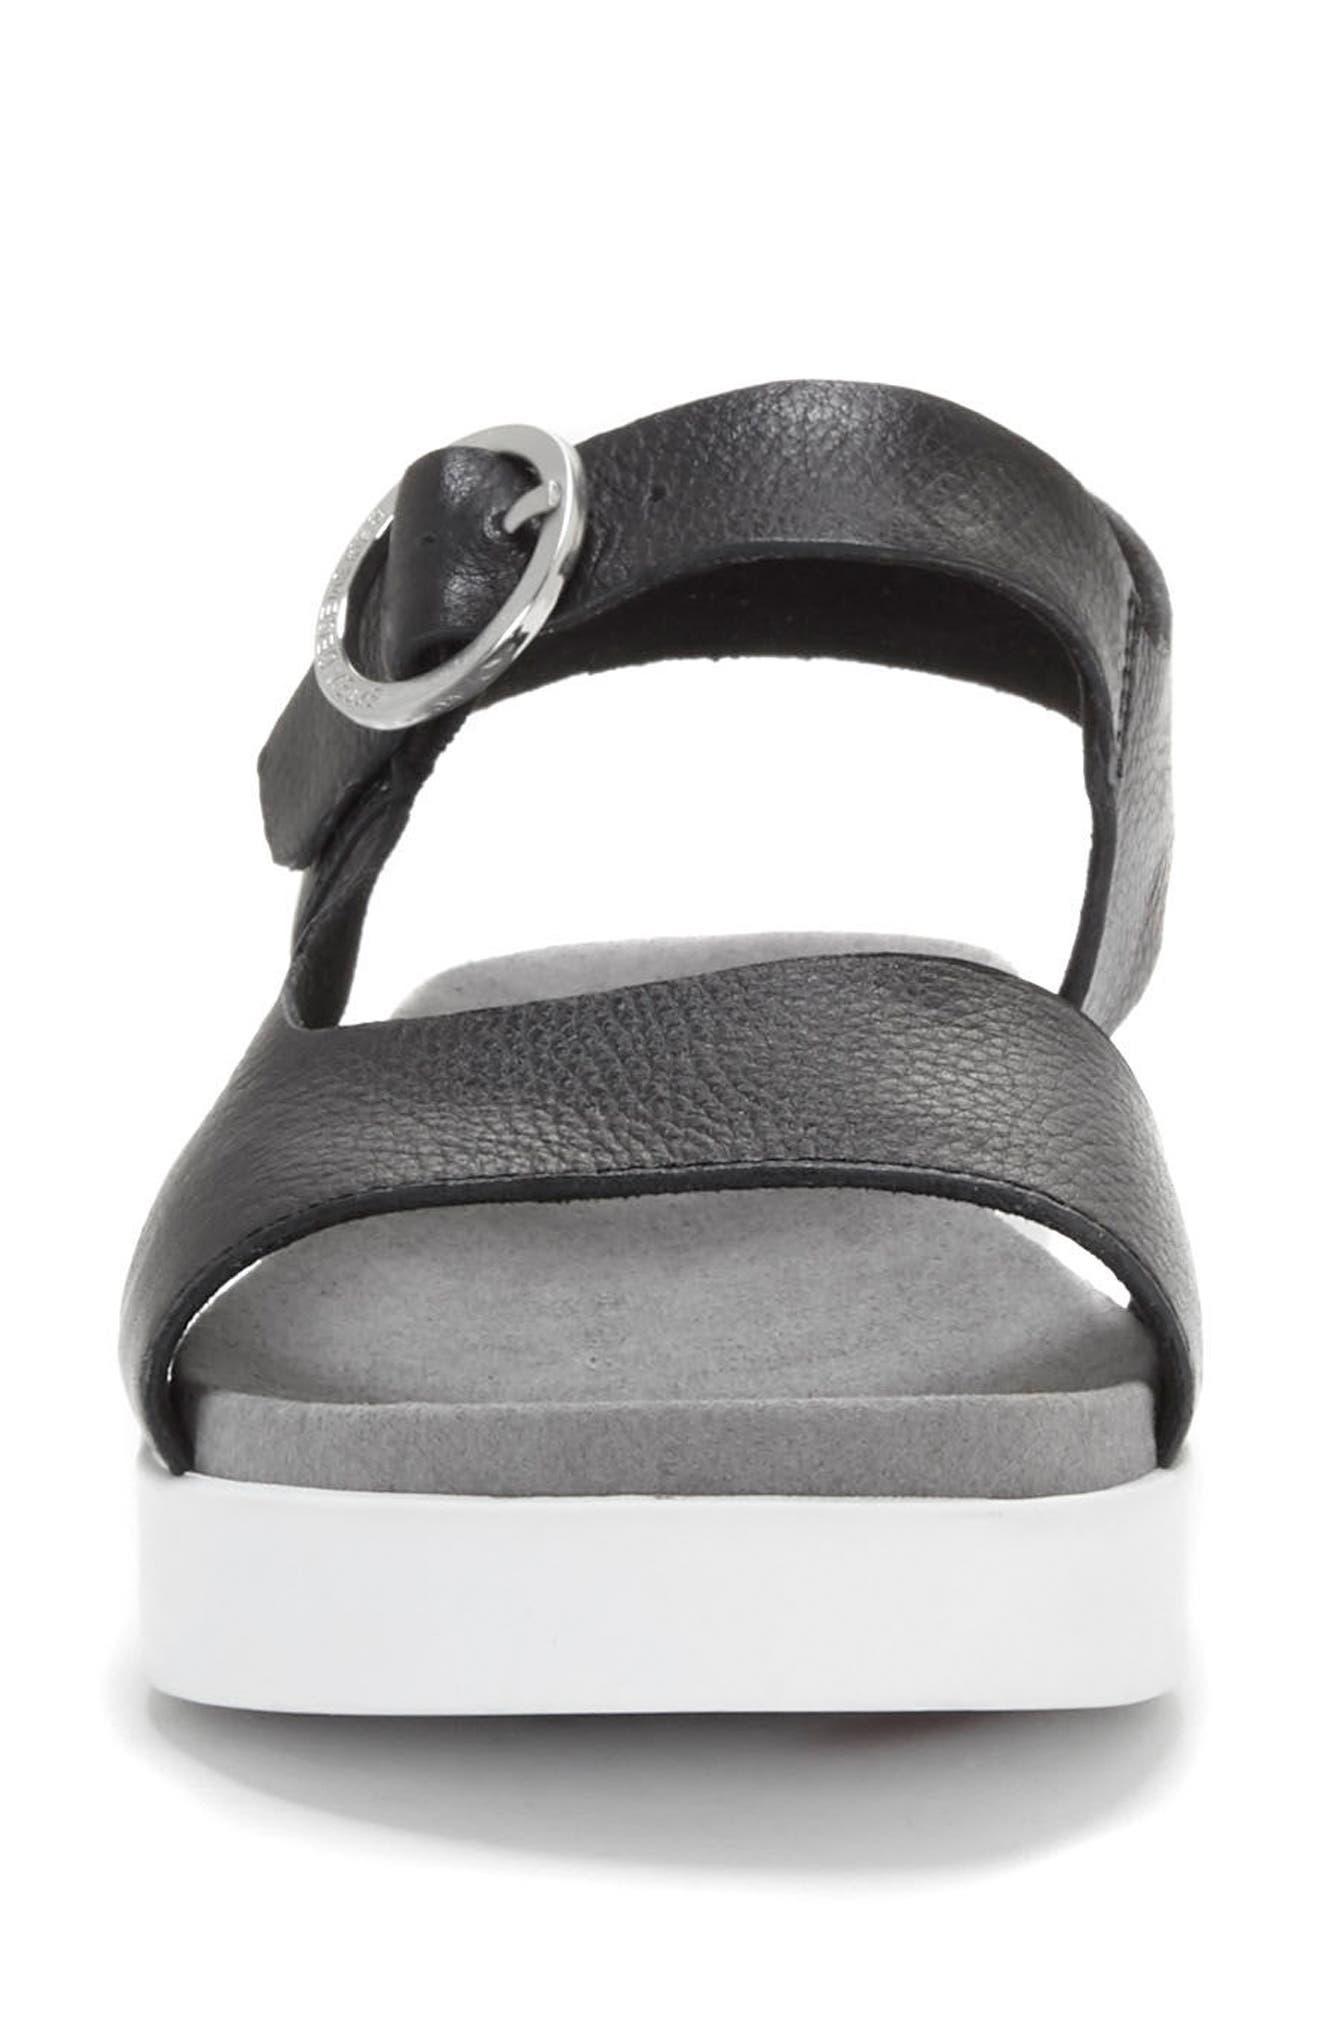 Caspin Sandal,                             Alternate thumbnail 4, color,                             002